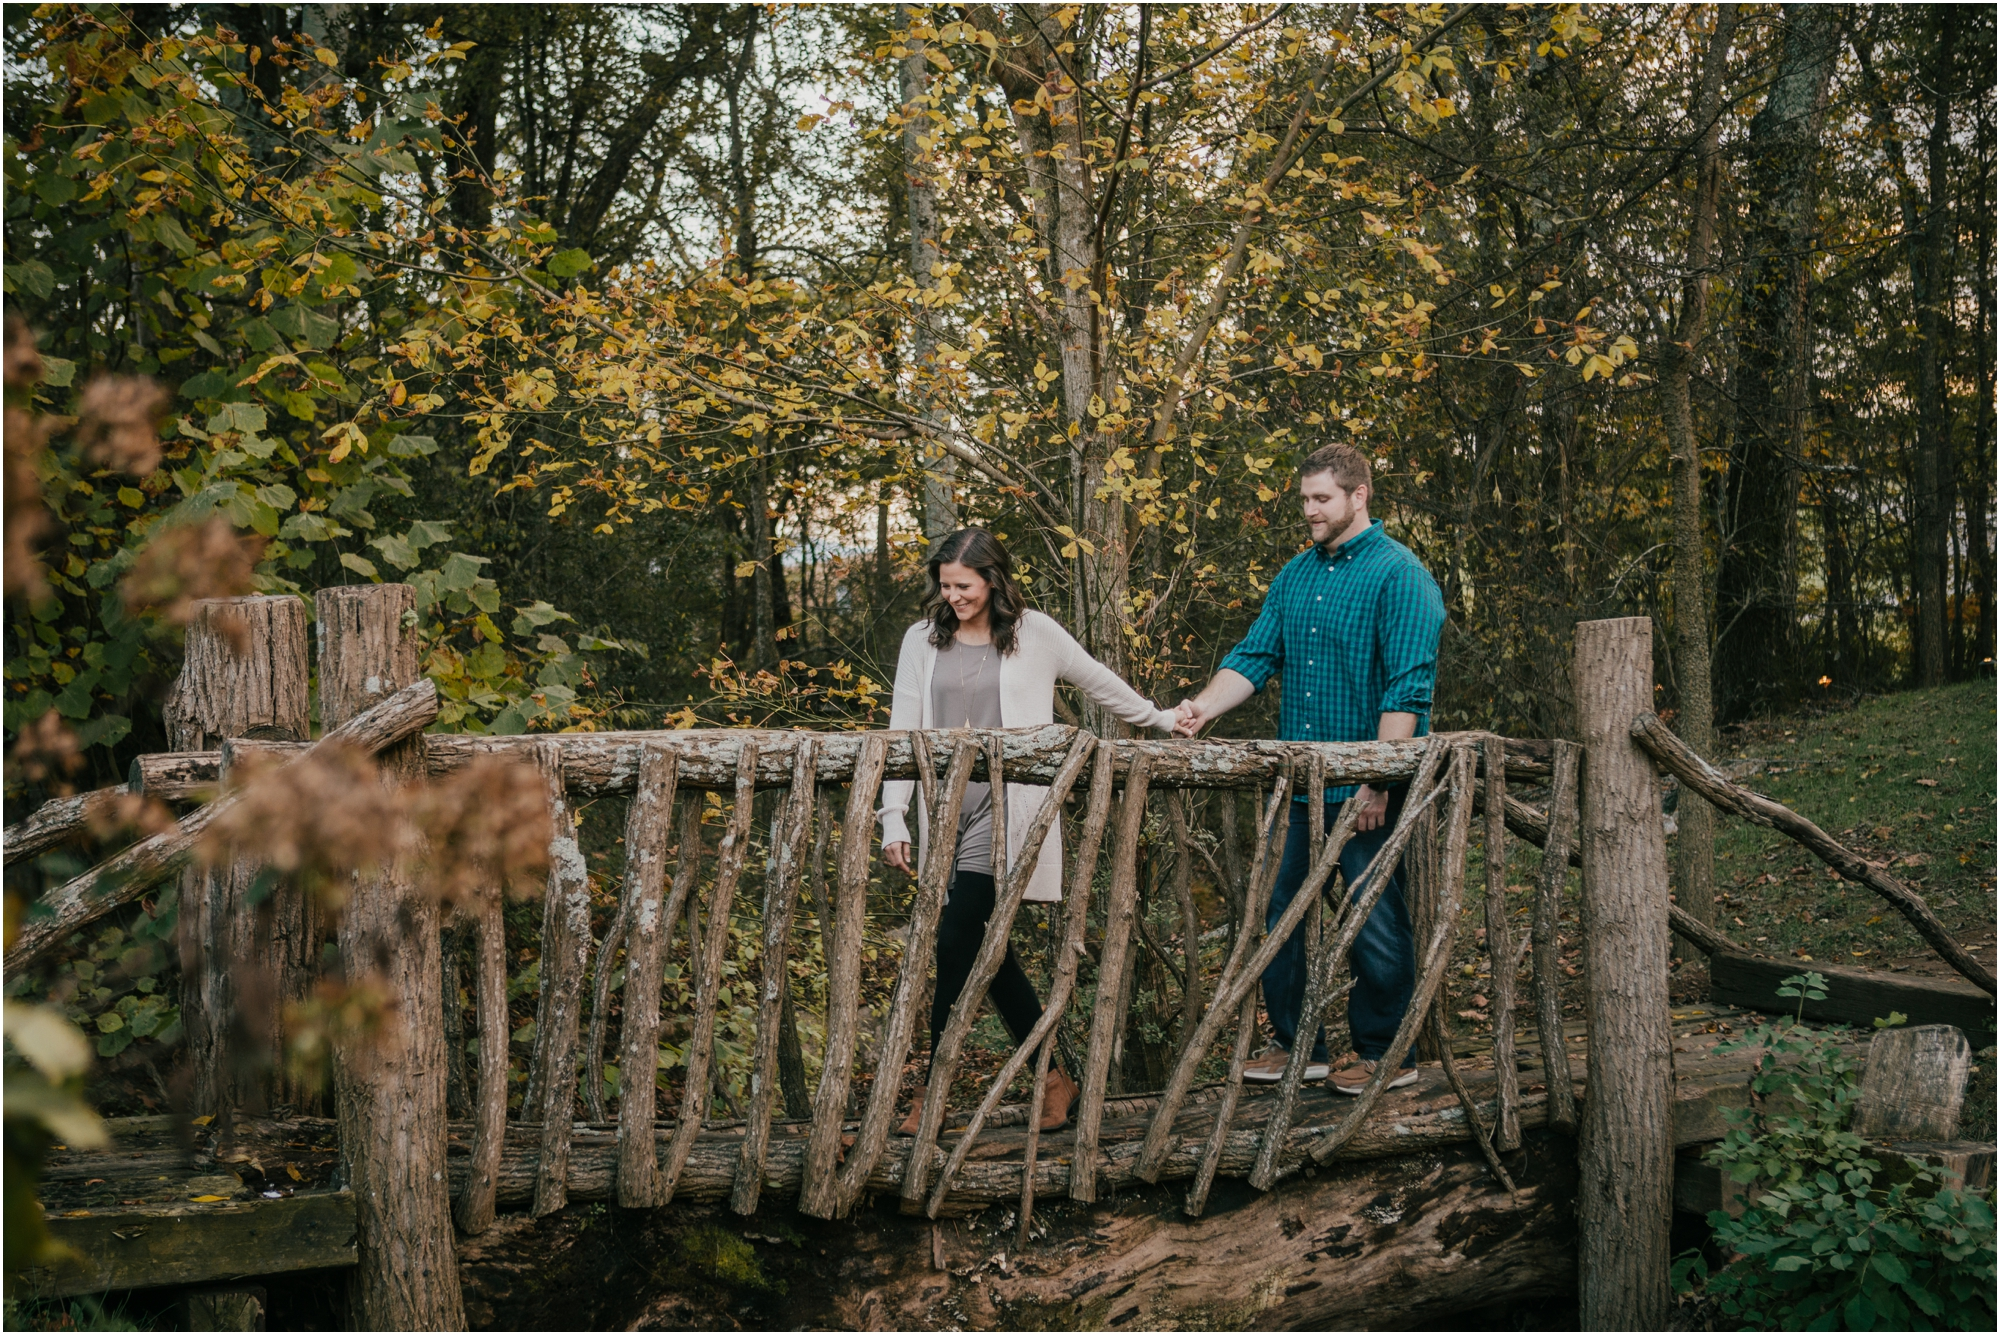 katy-sergent-millstone-limestone-tn-rustic-fall-engagement-session-adventurous-outdoors-intimate-elopement-wedding-northeast-johnson-city-photographer_0016.jpg